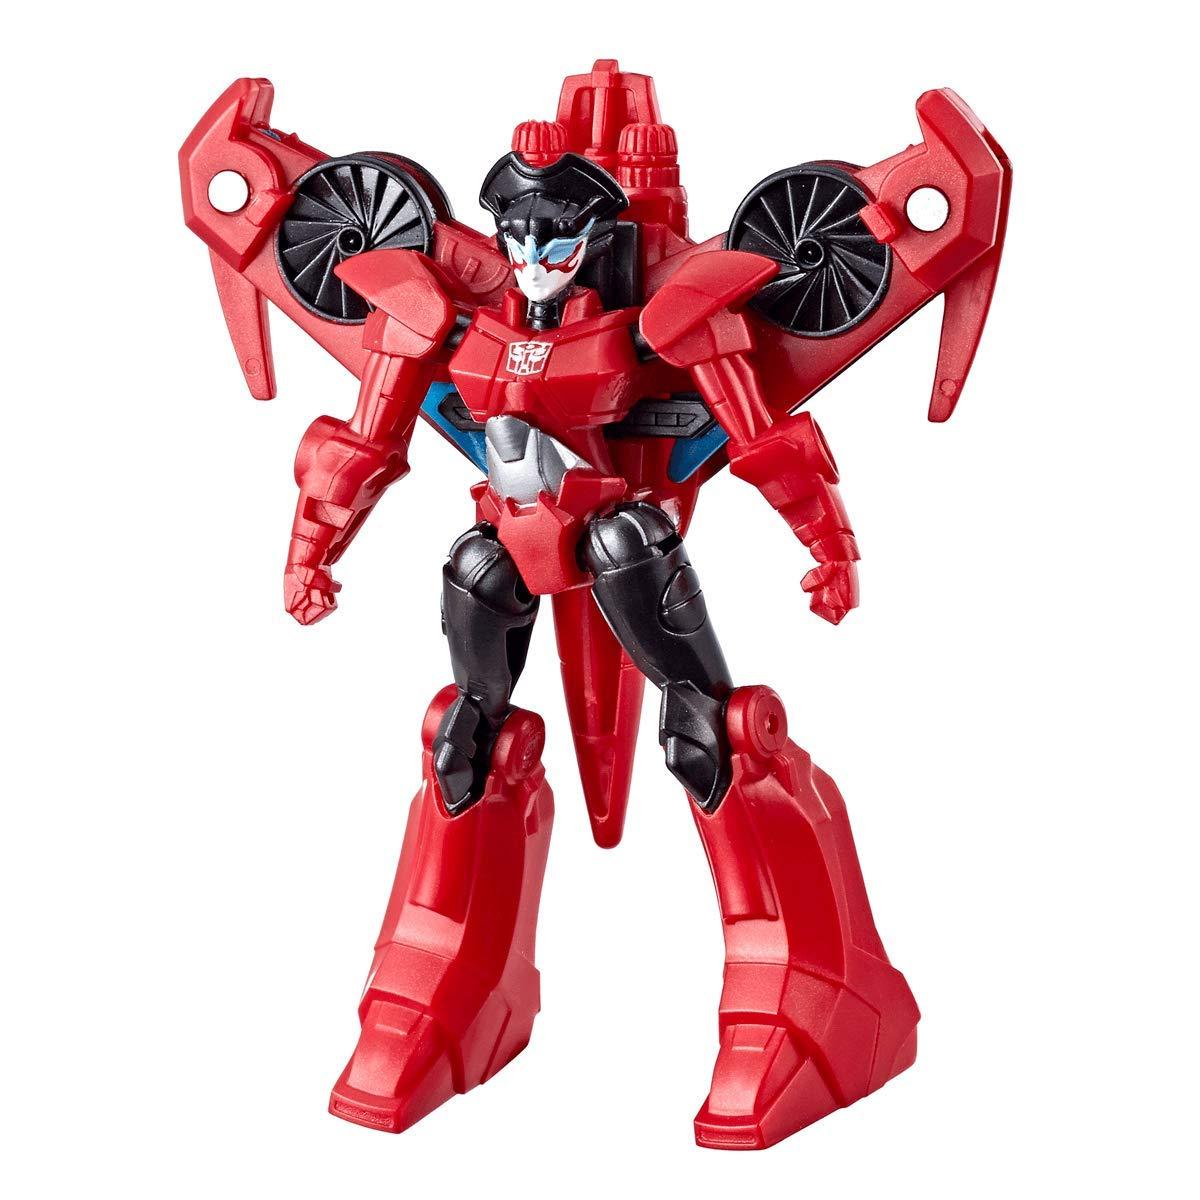 Figurina Transformers Cyberverse Scout, Windblade, E1896